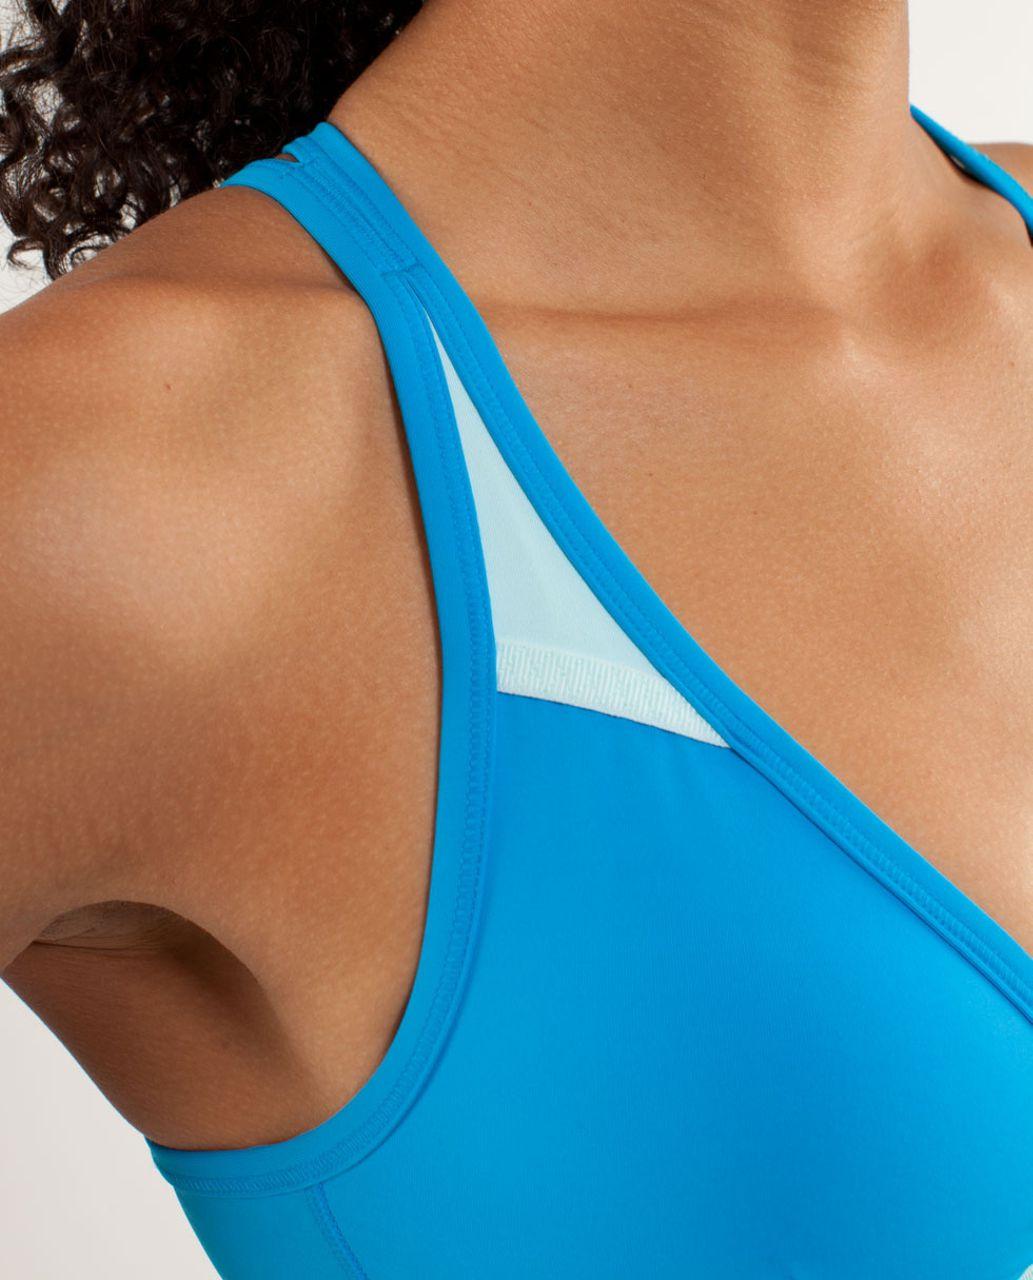 Lululemon Heat It Up Bra - Beach Blanket Blue / Aquamarine